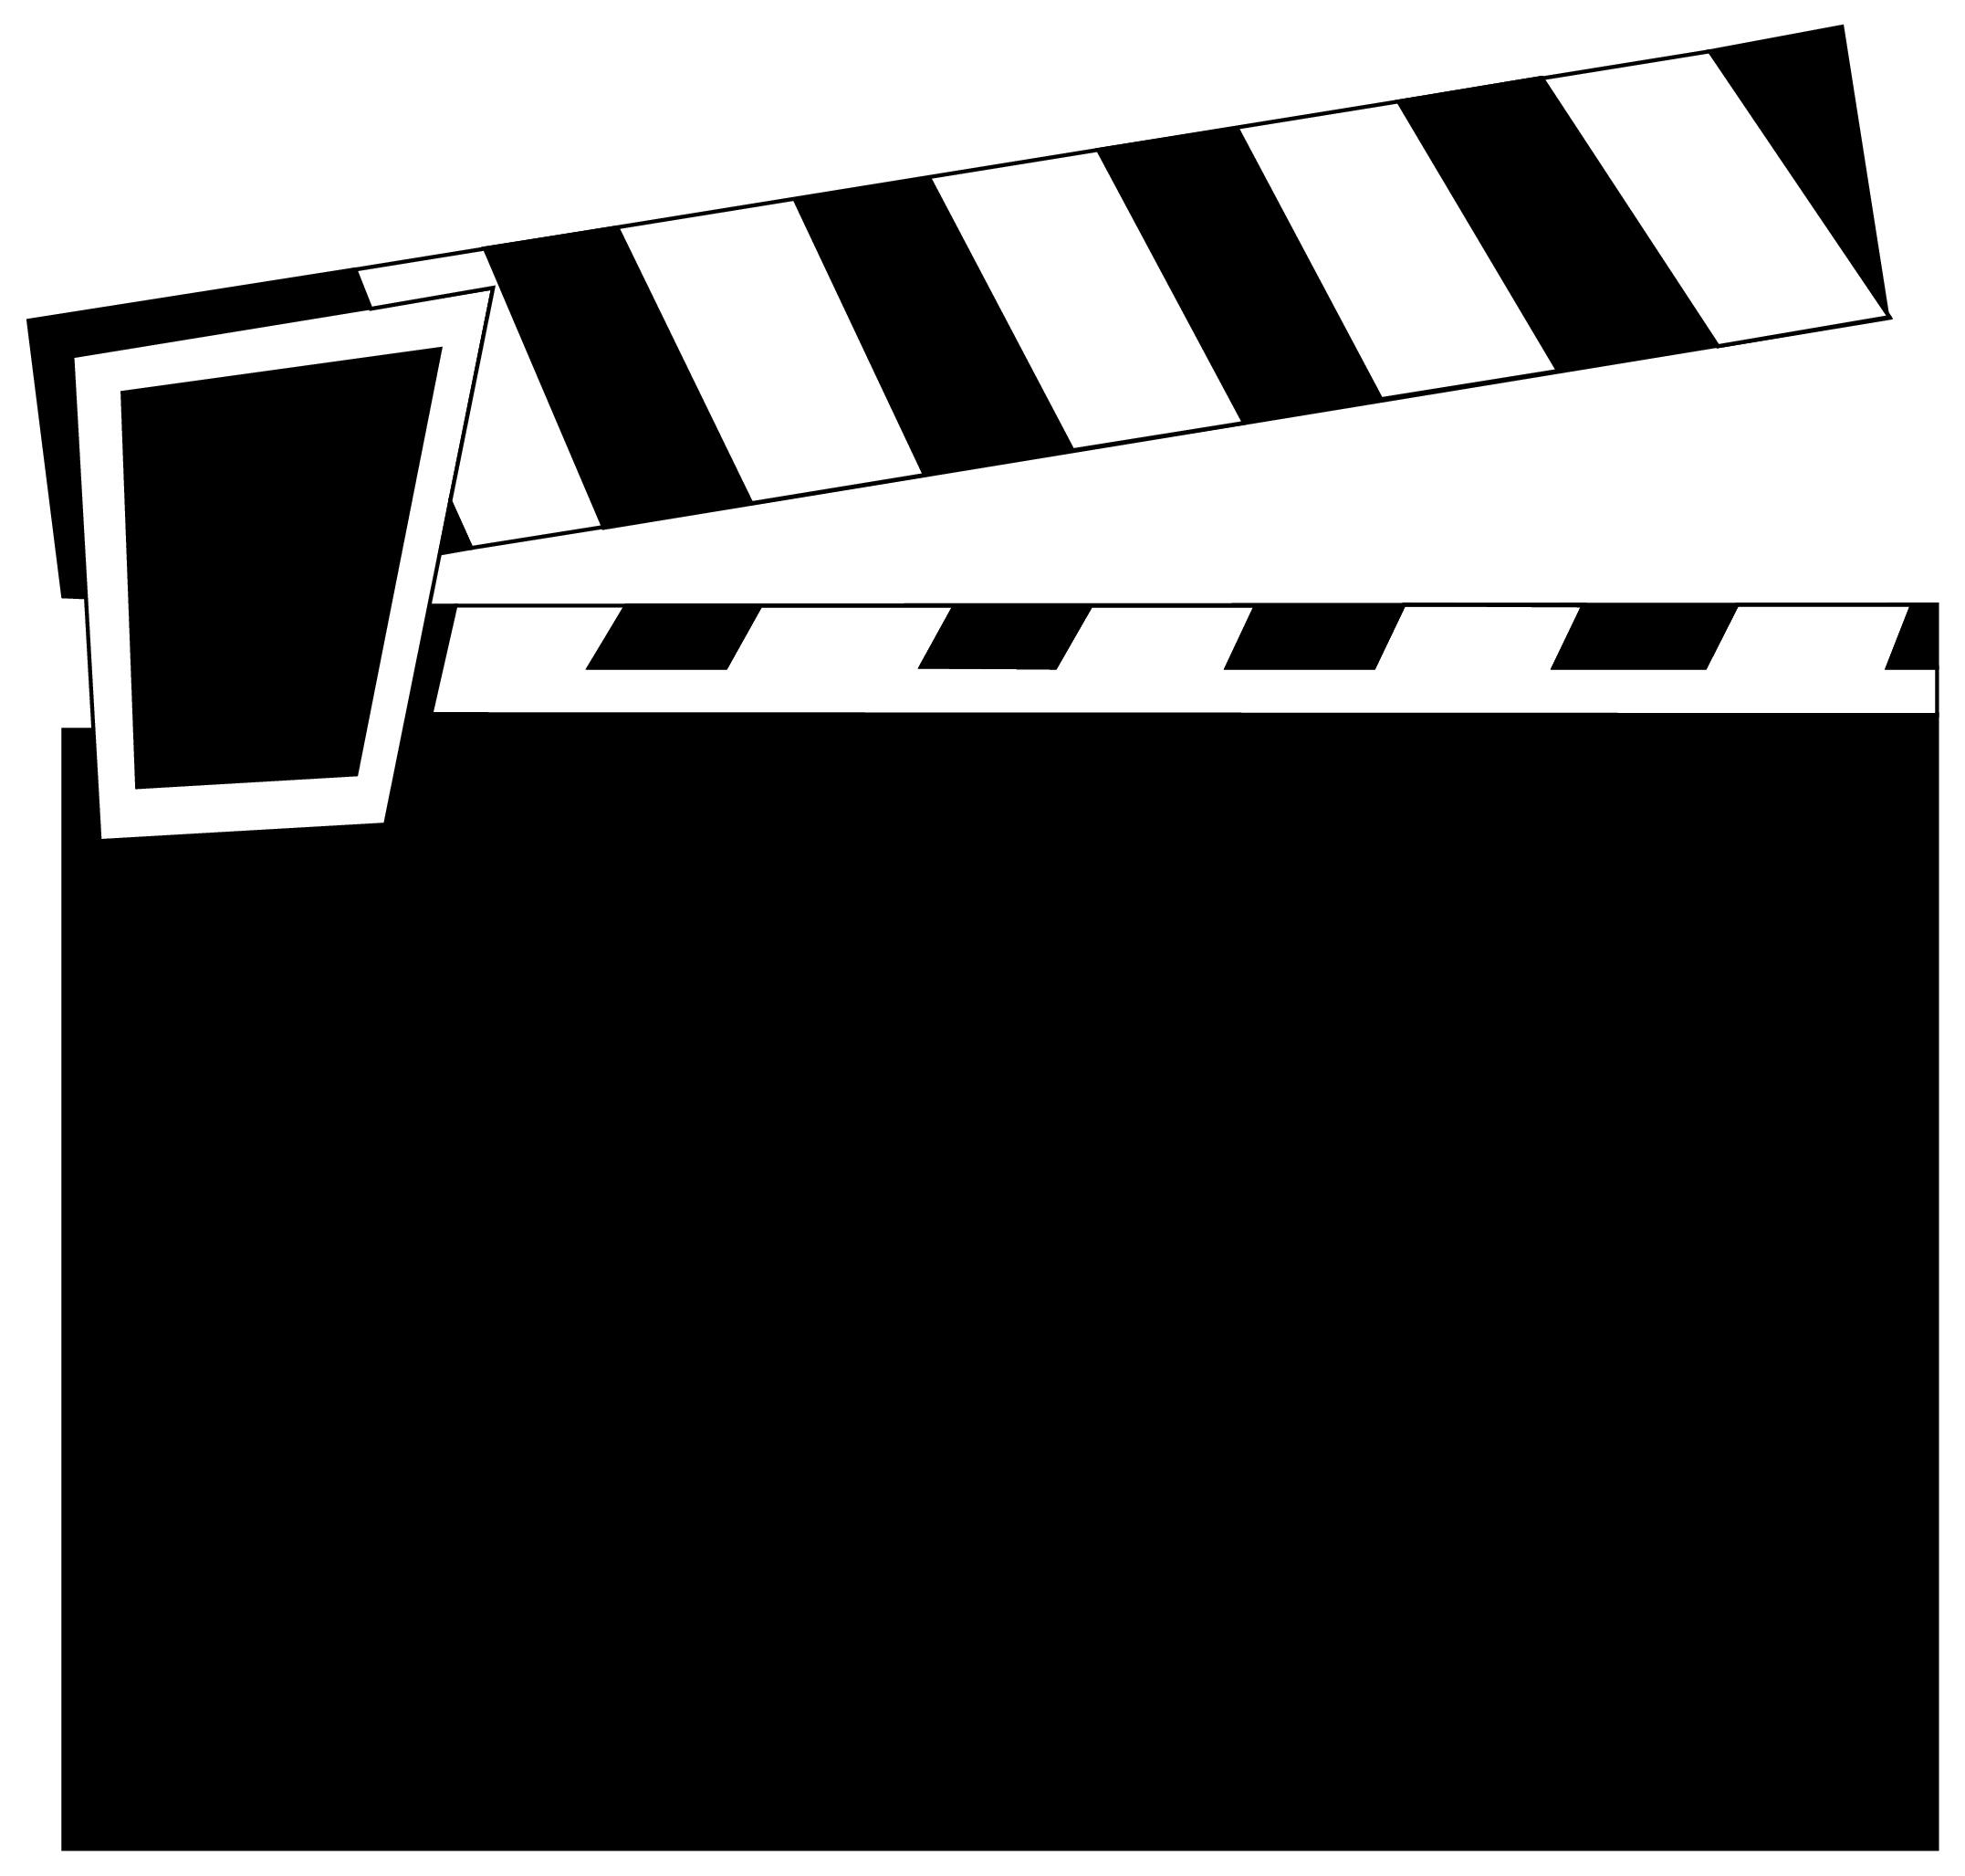 Clapboard cliparts free download. Film clipart clap board